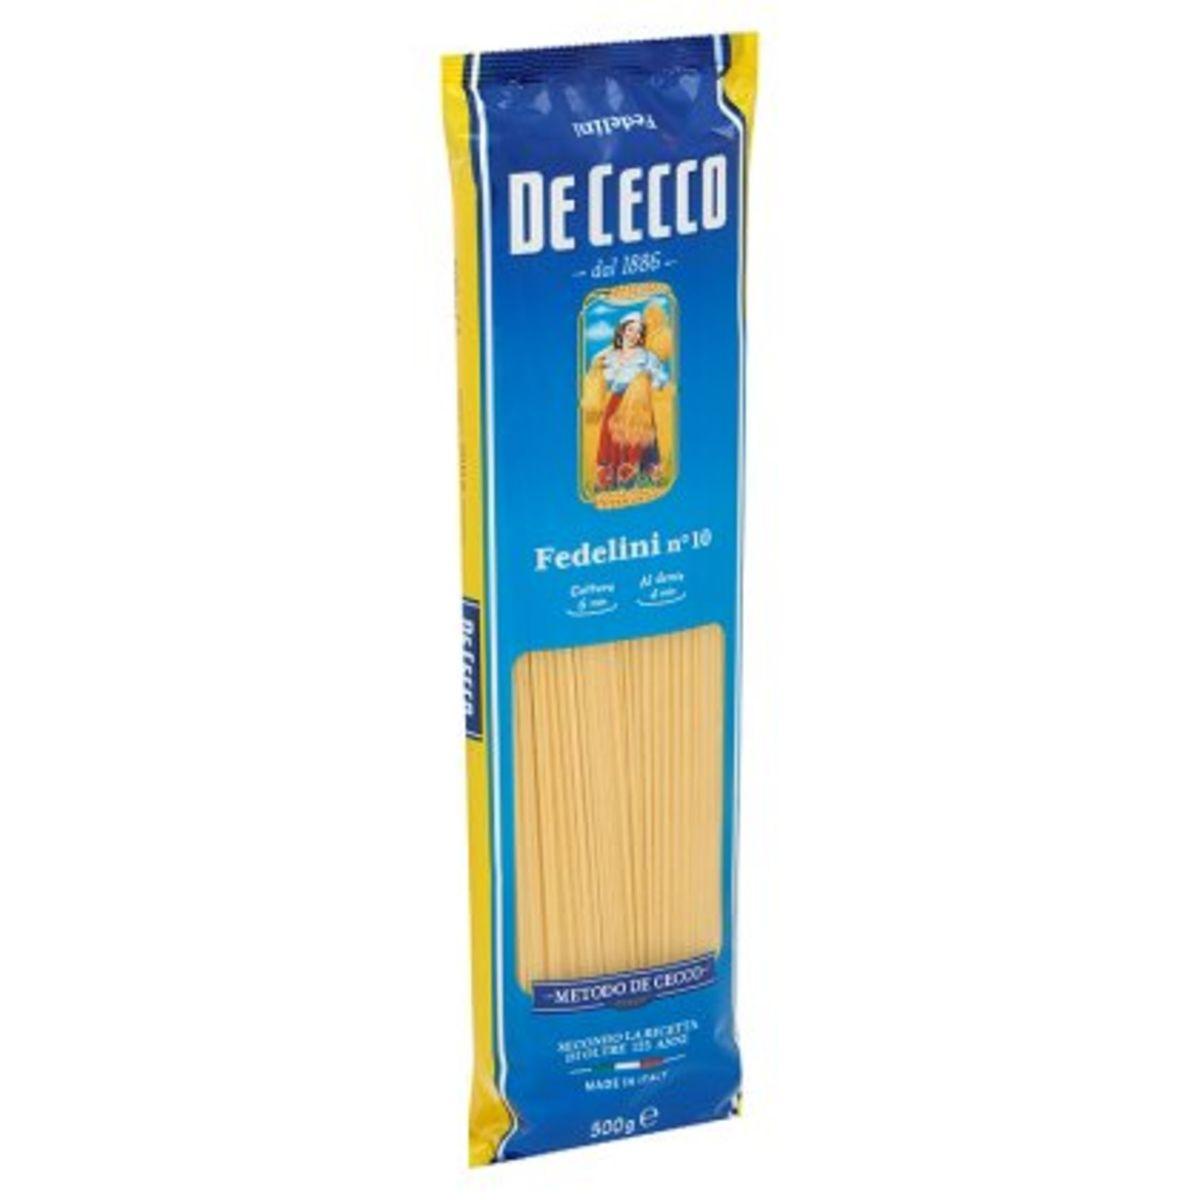 De Cecco Fedelini n°10 500 g